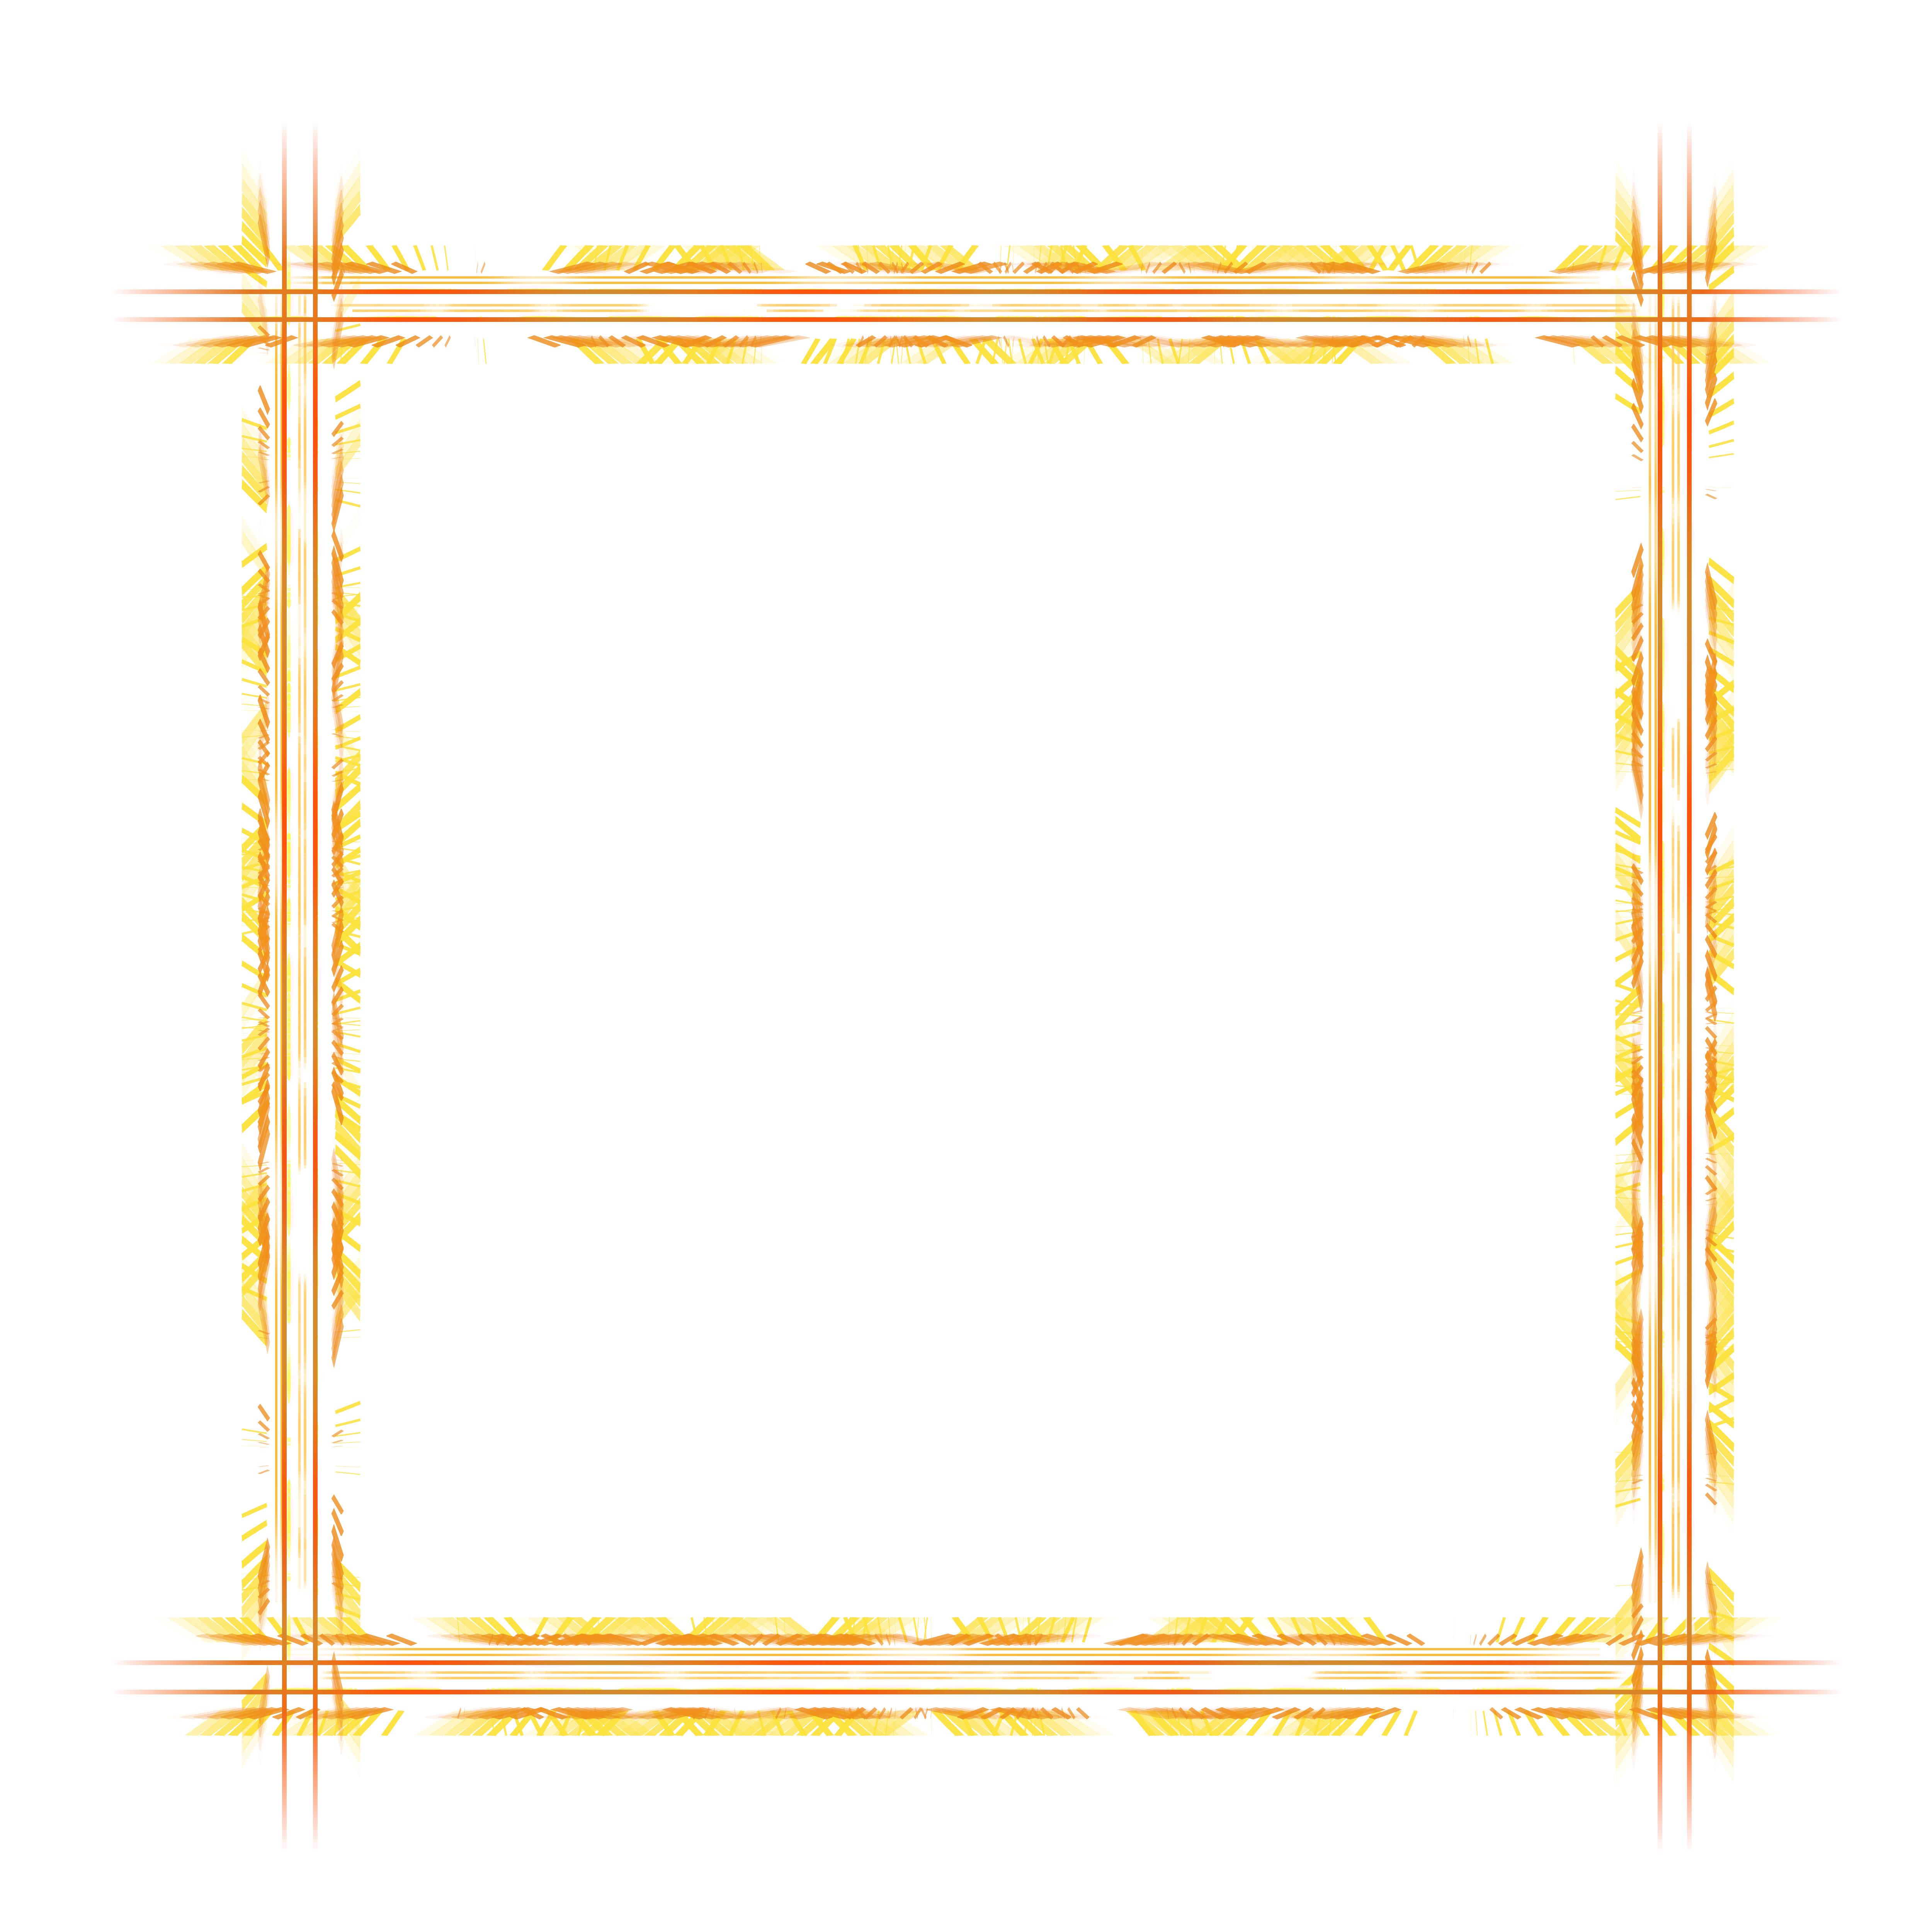 рамки для фотографий фотошоп: